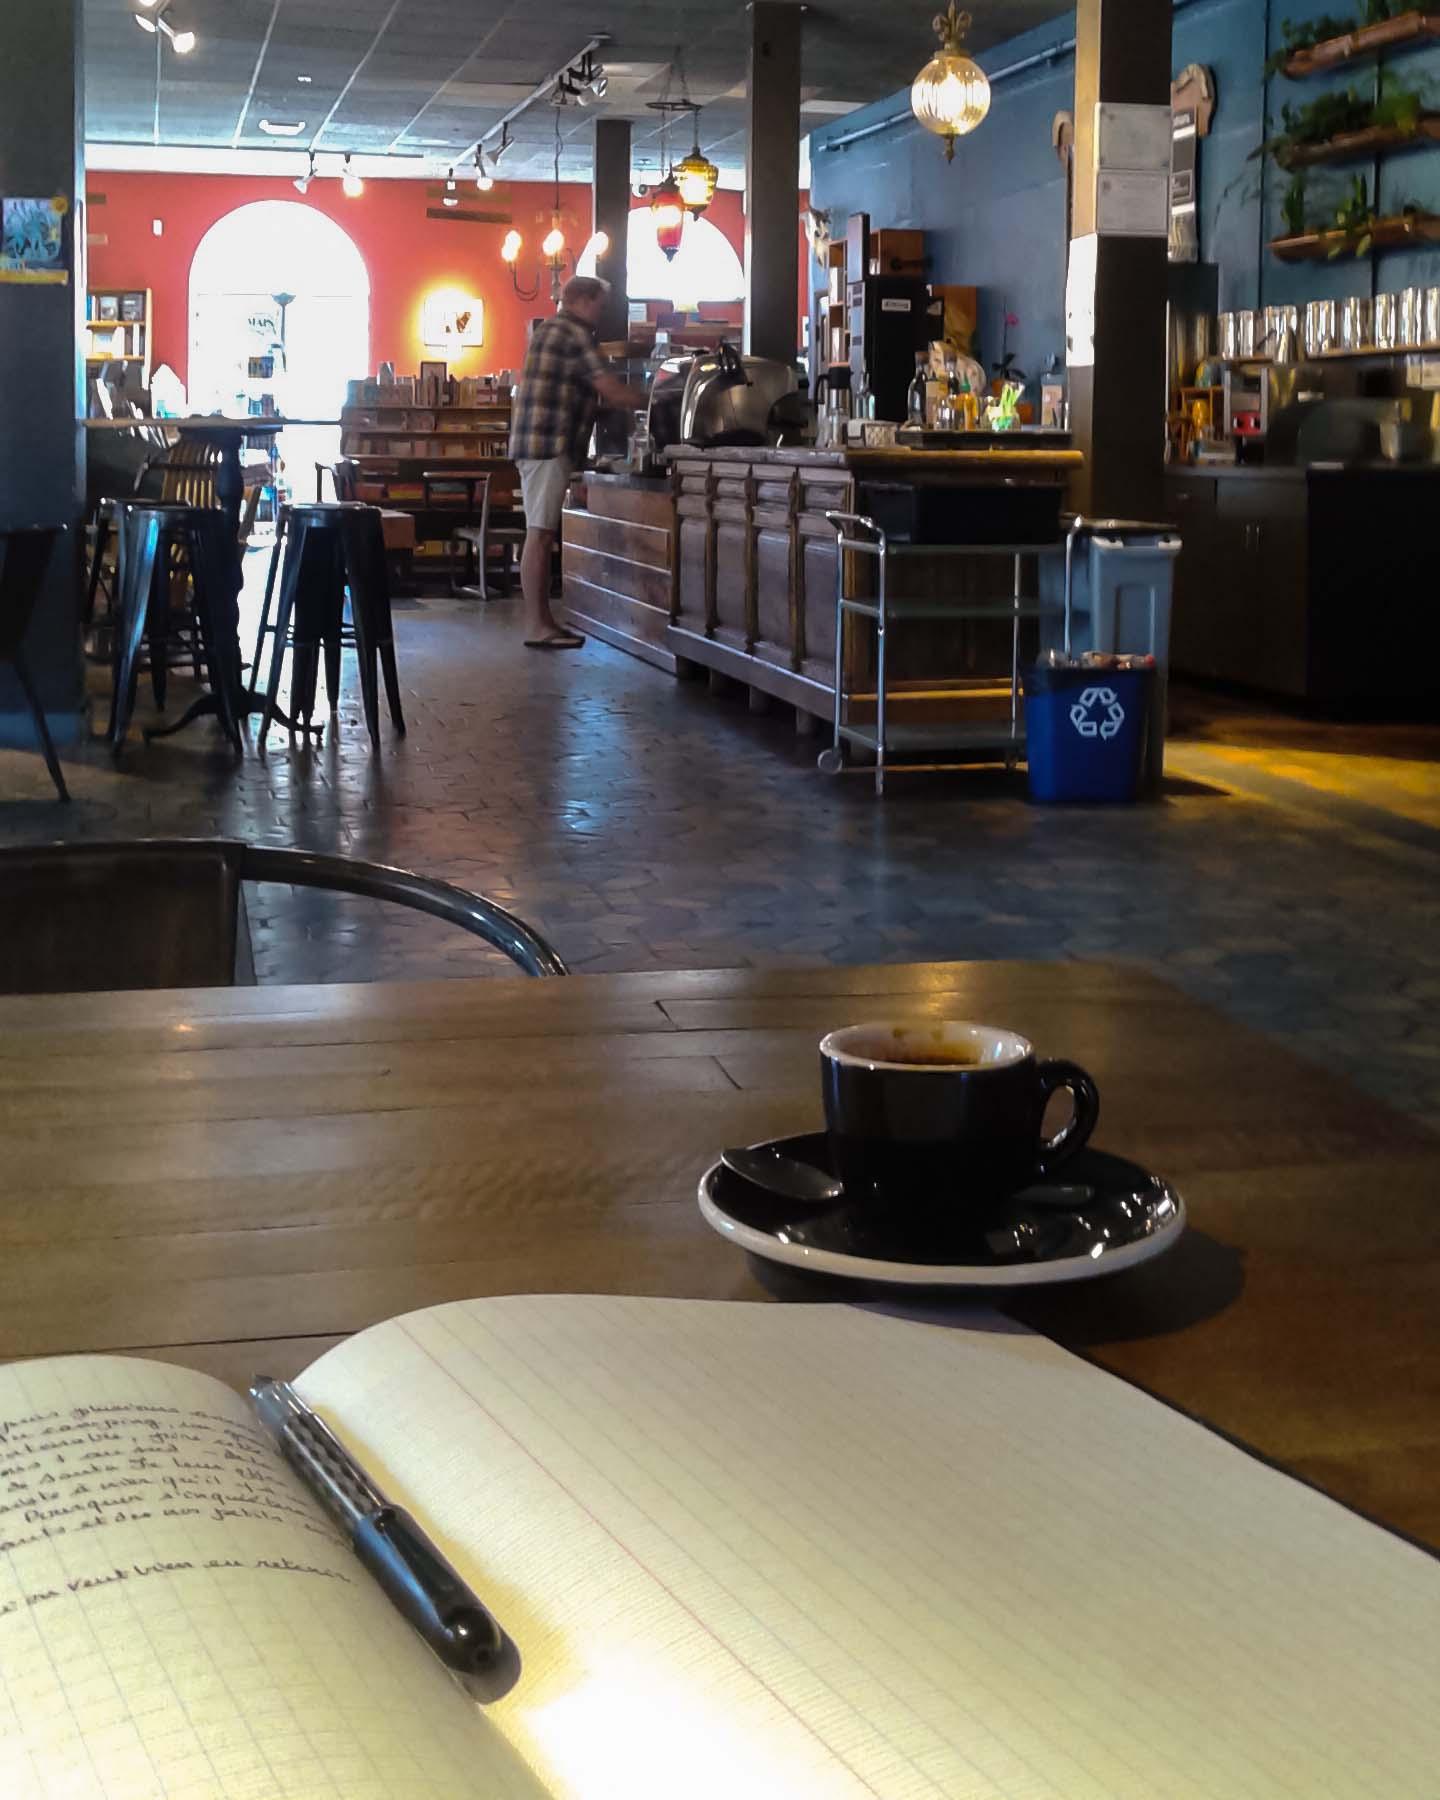 Santa Fe - Café Librairie Collected Works